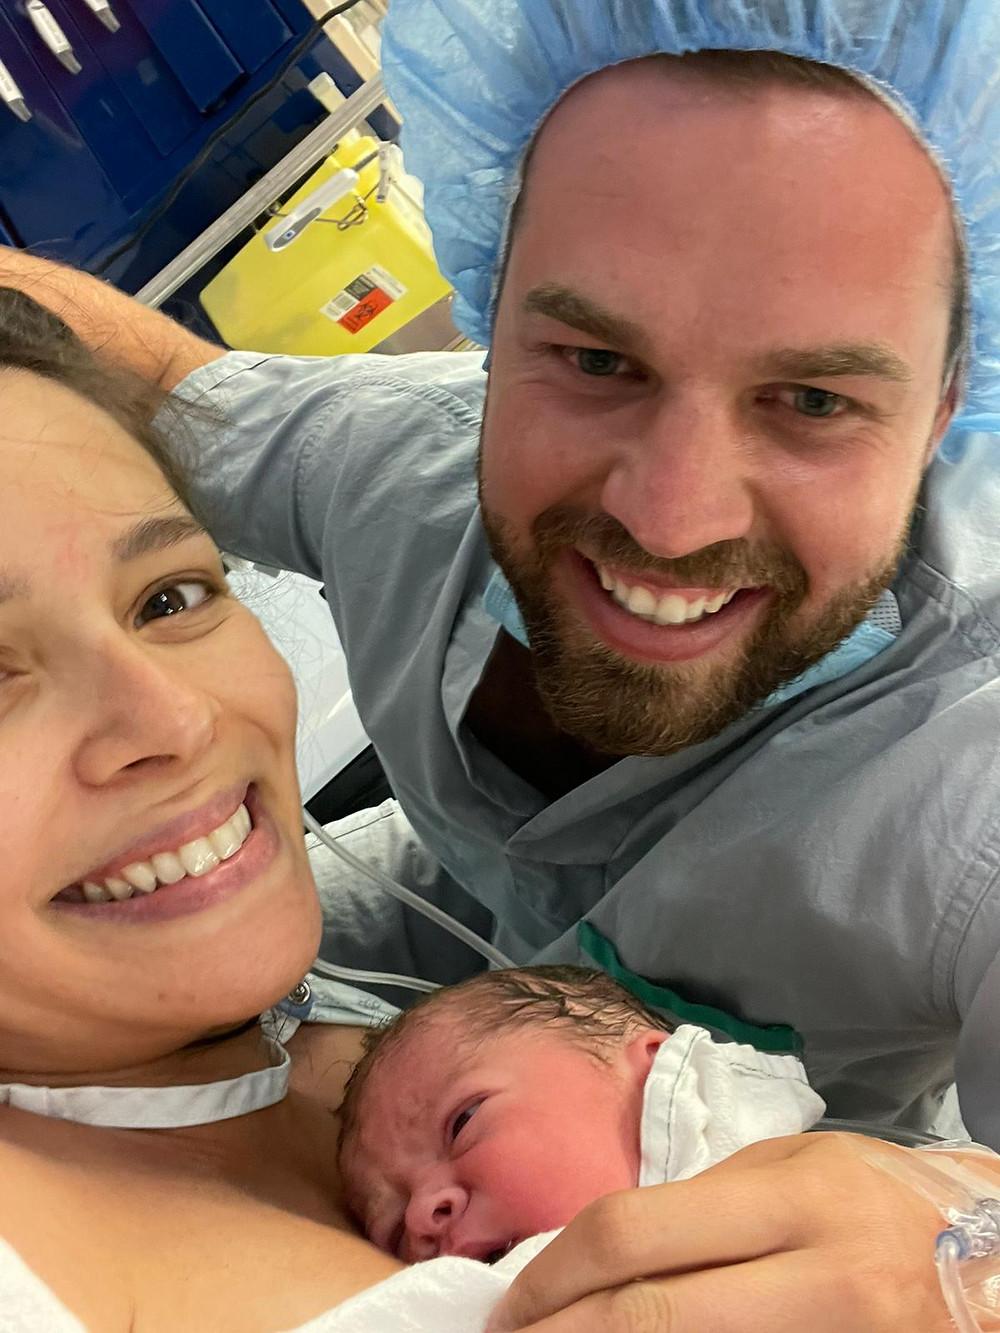 Unmedicated breech birth using Christian Hypnobirthing